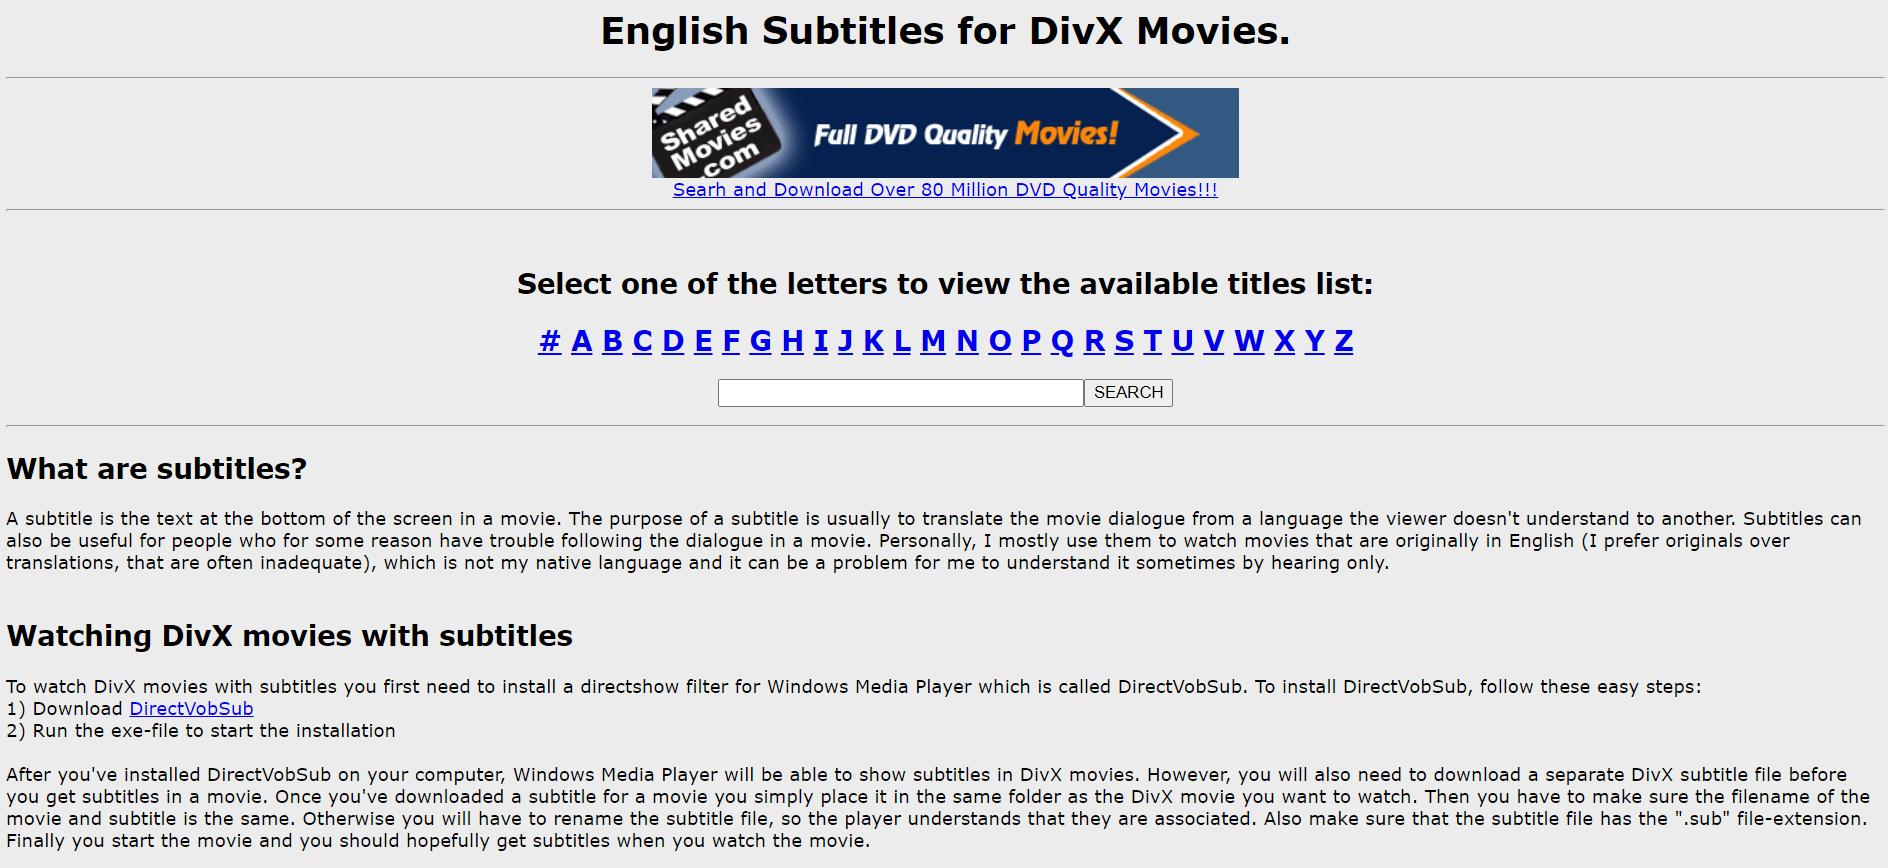 DivX Movies English Subtitles